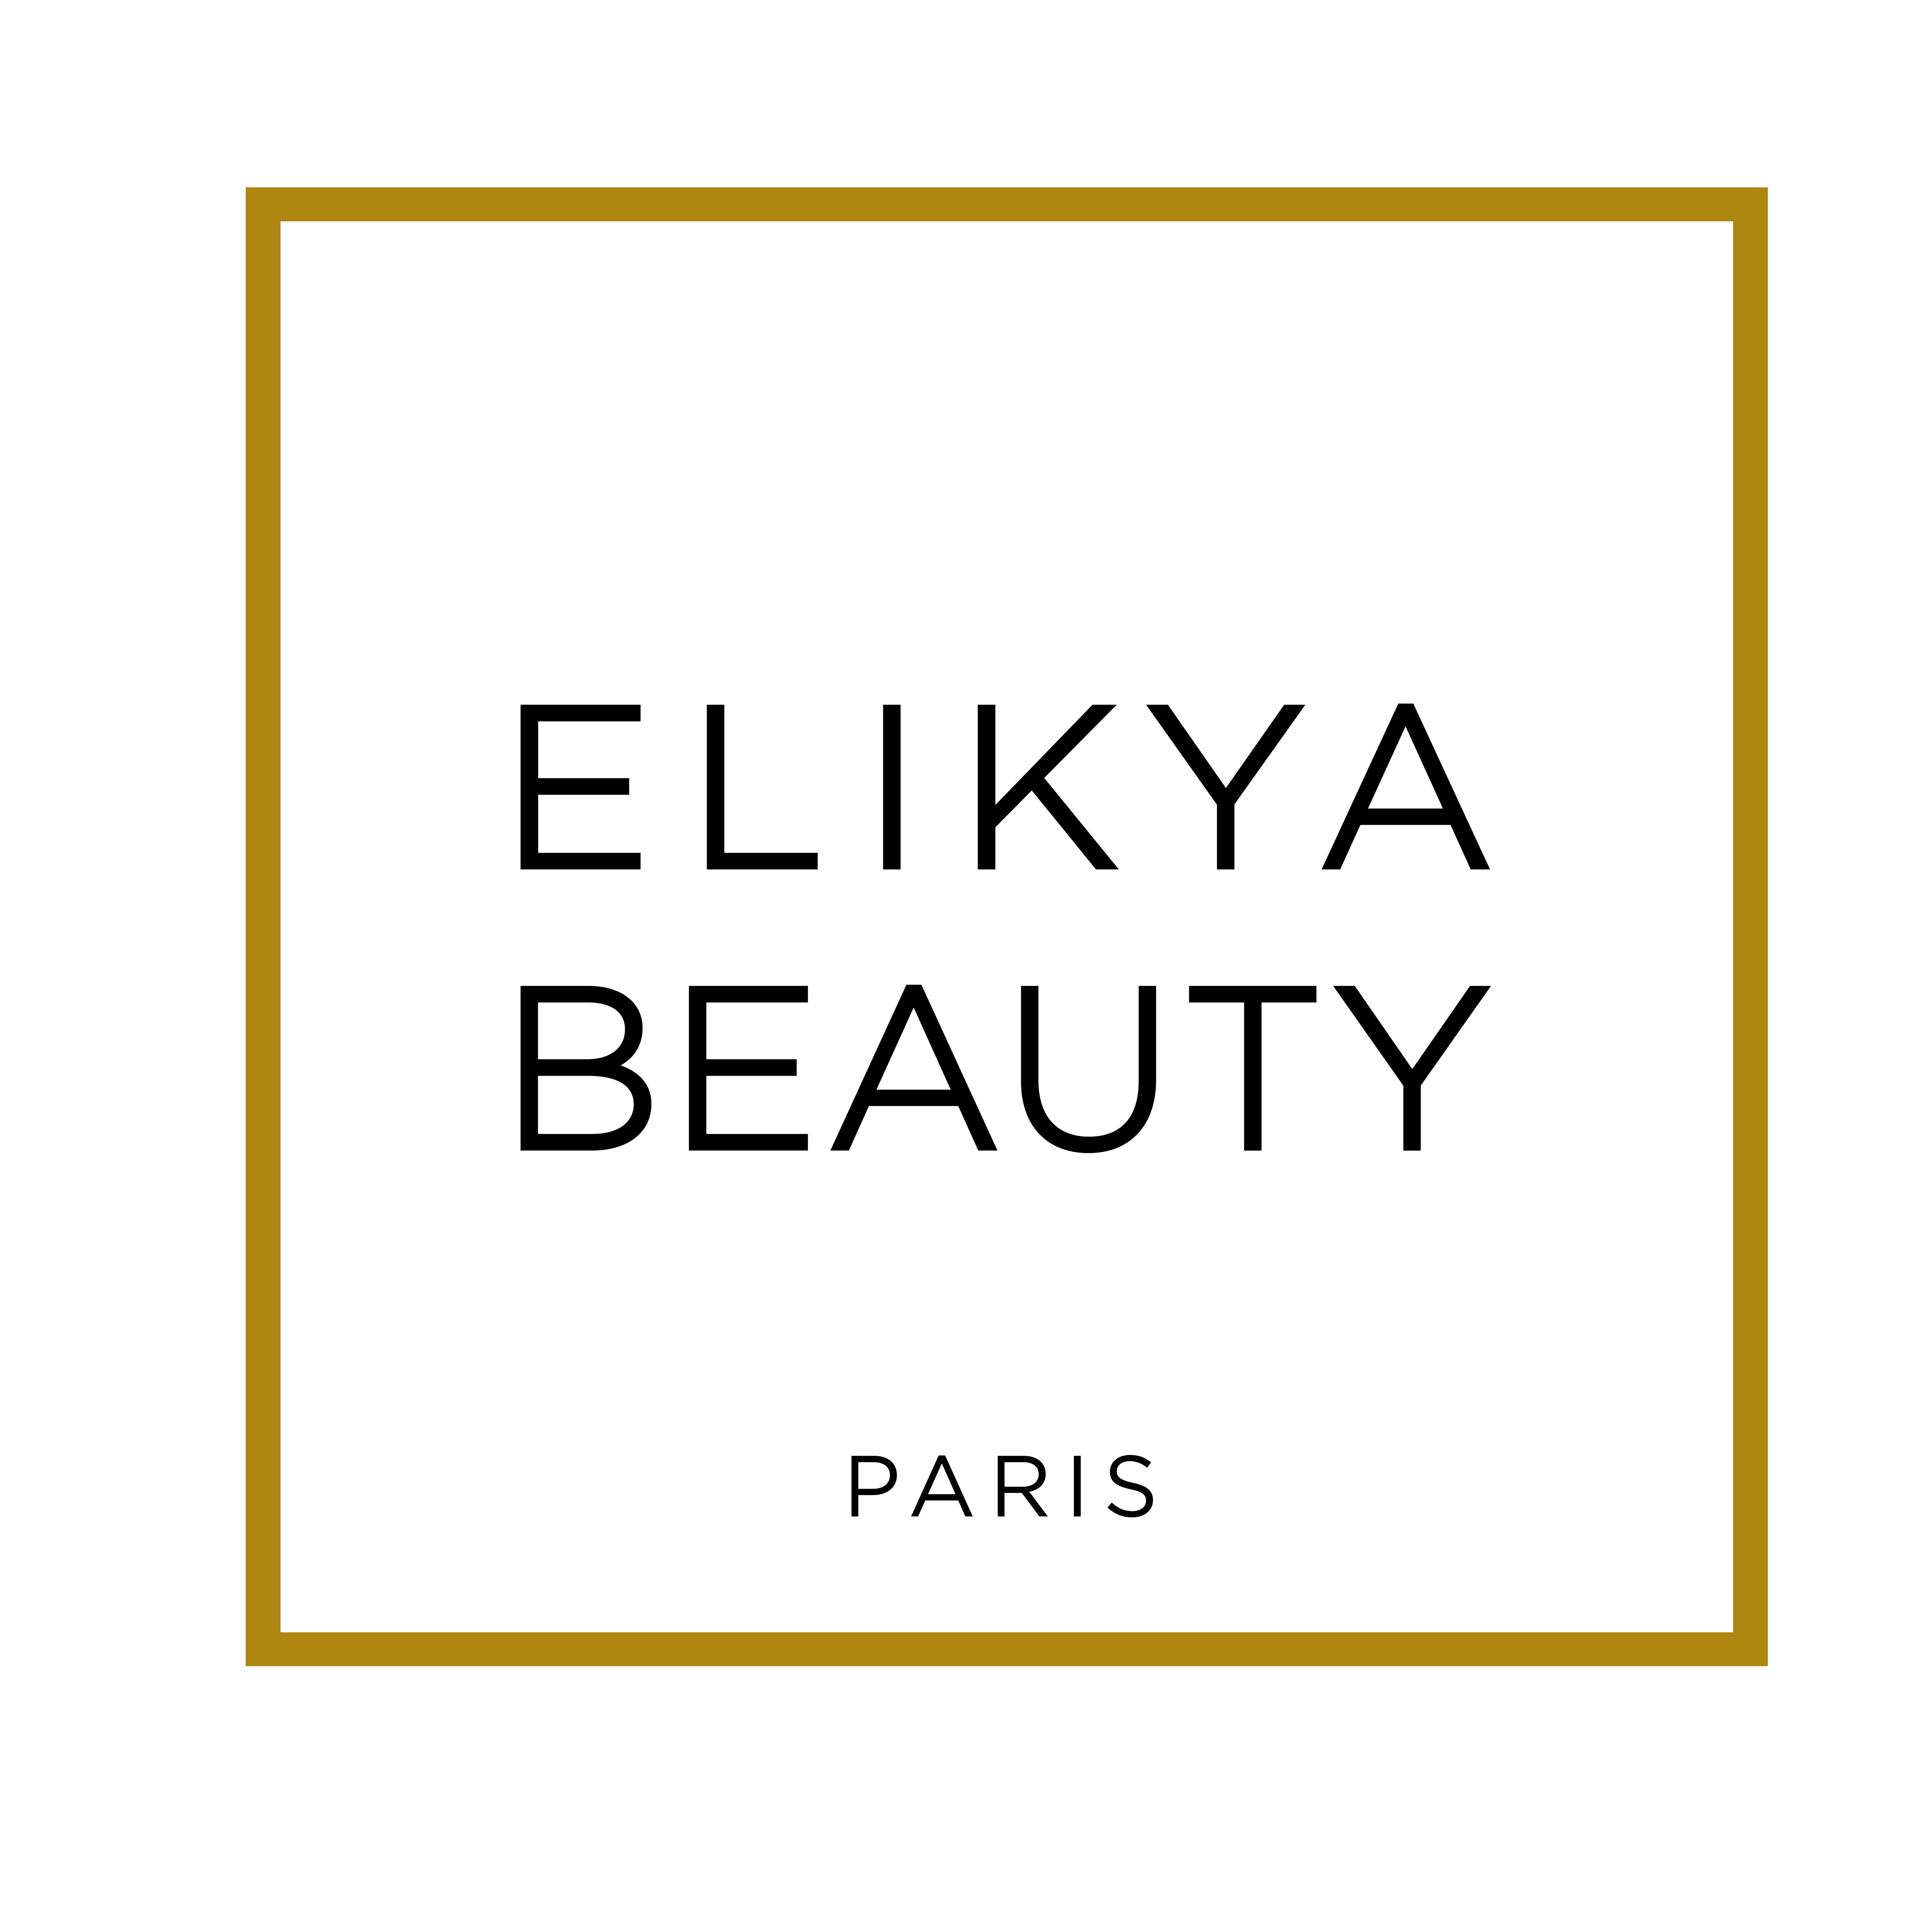 Elikya Beauty